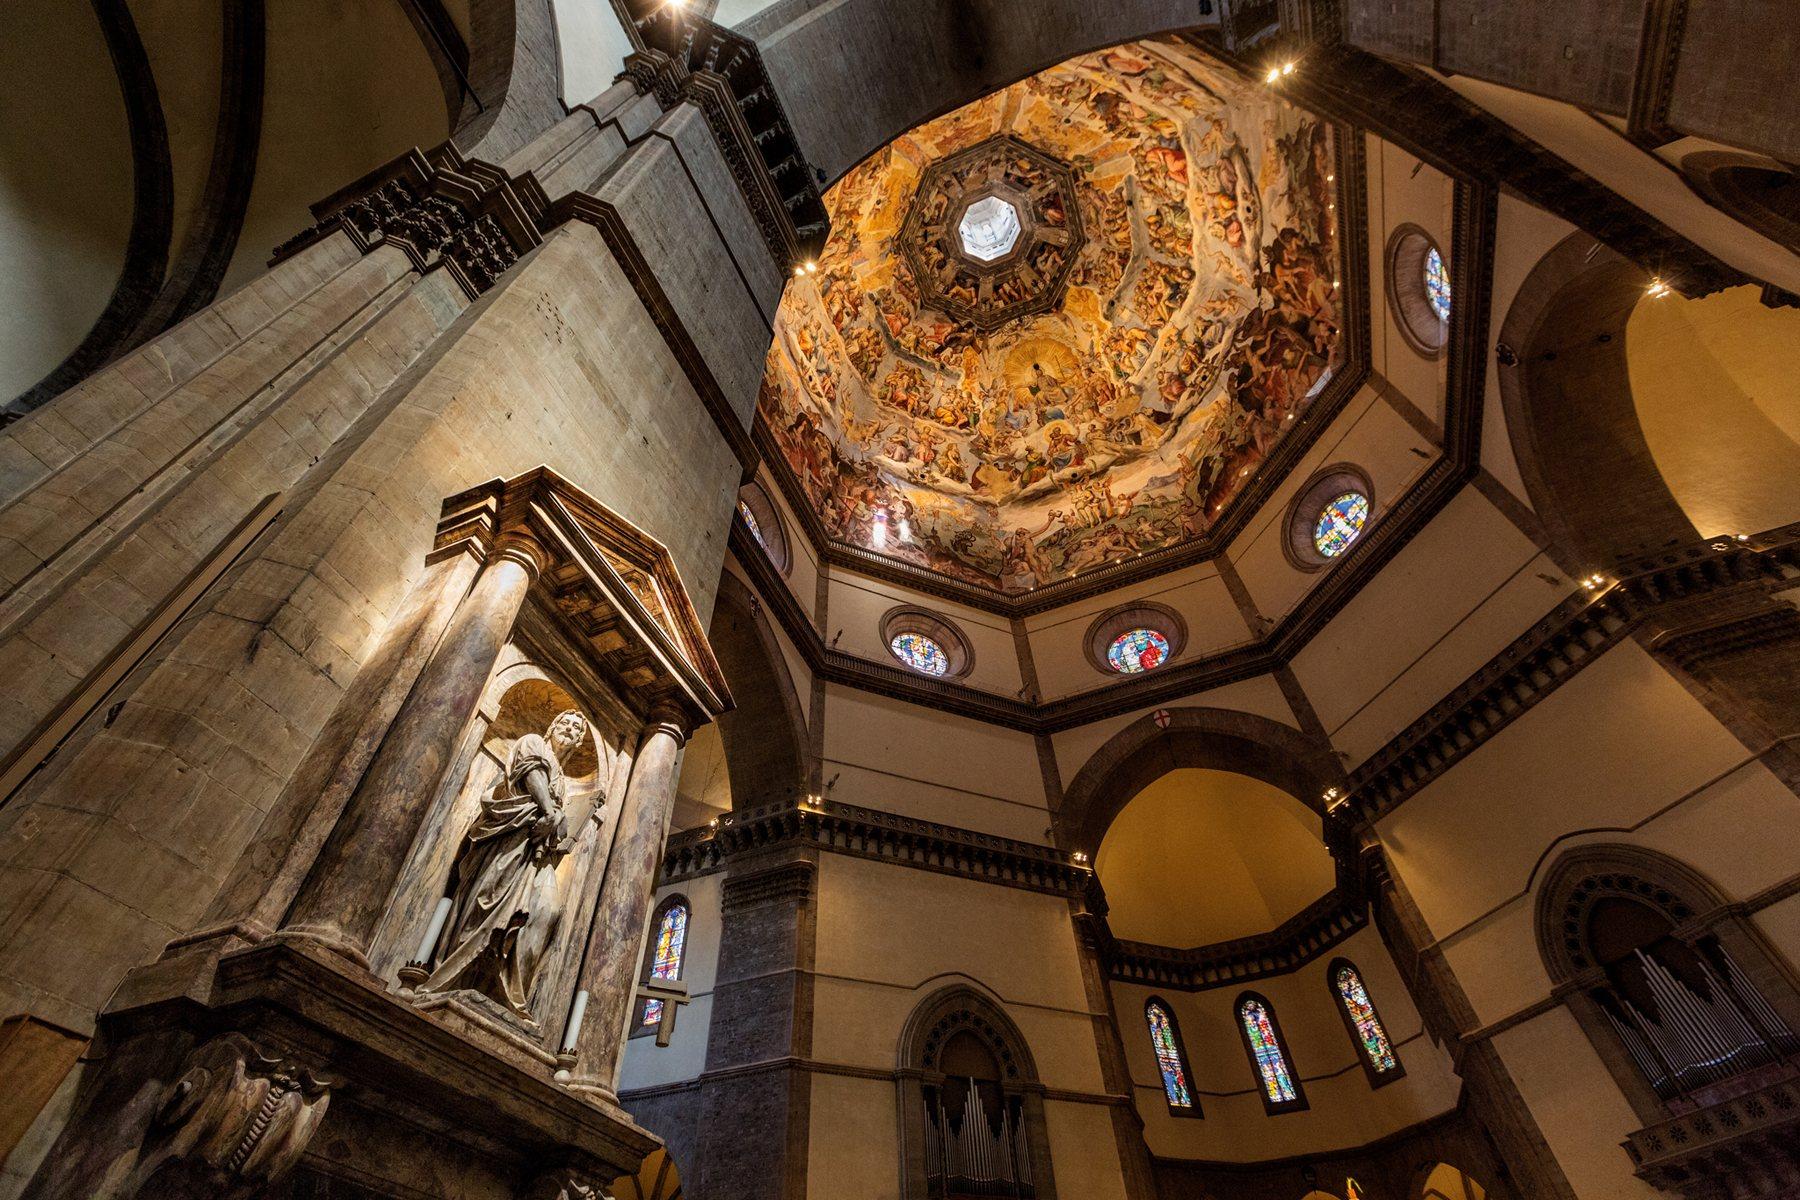 Cúpula de Santa Maria del Fiore, Florencia.